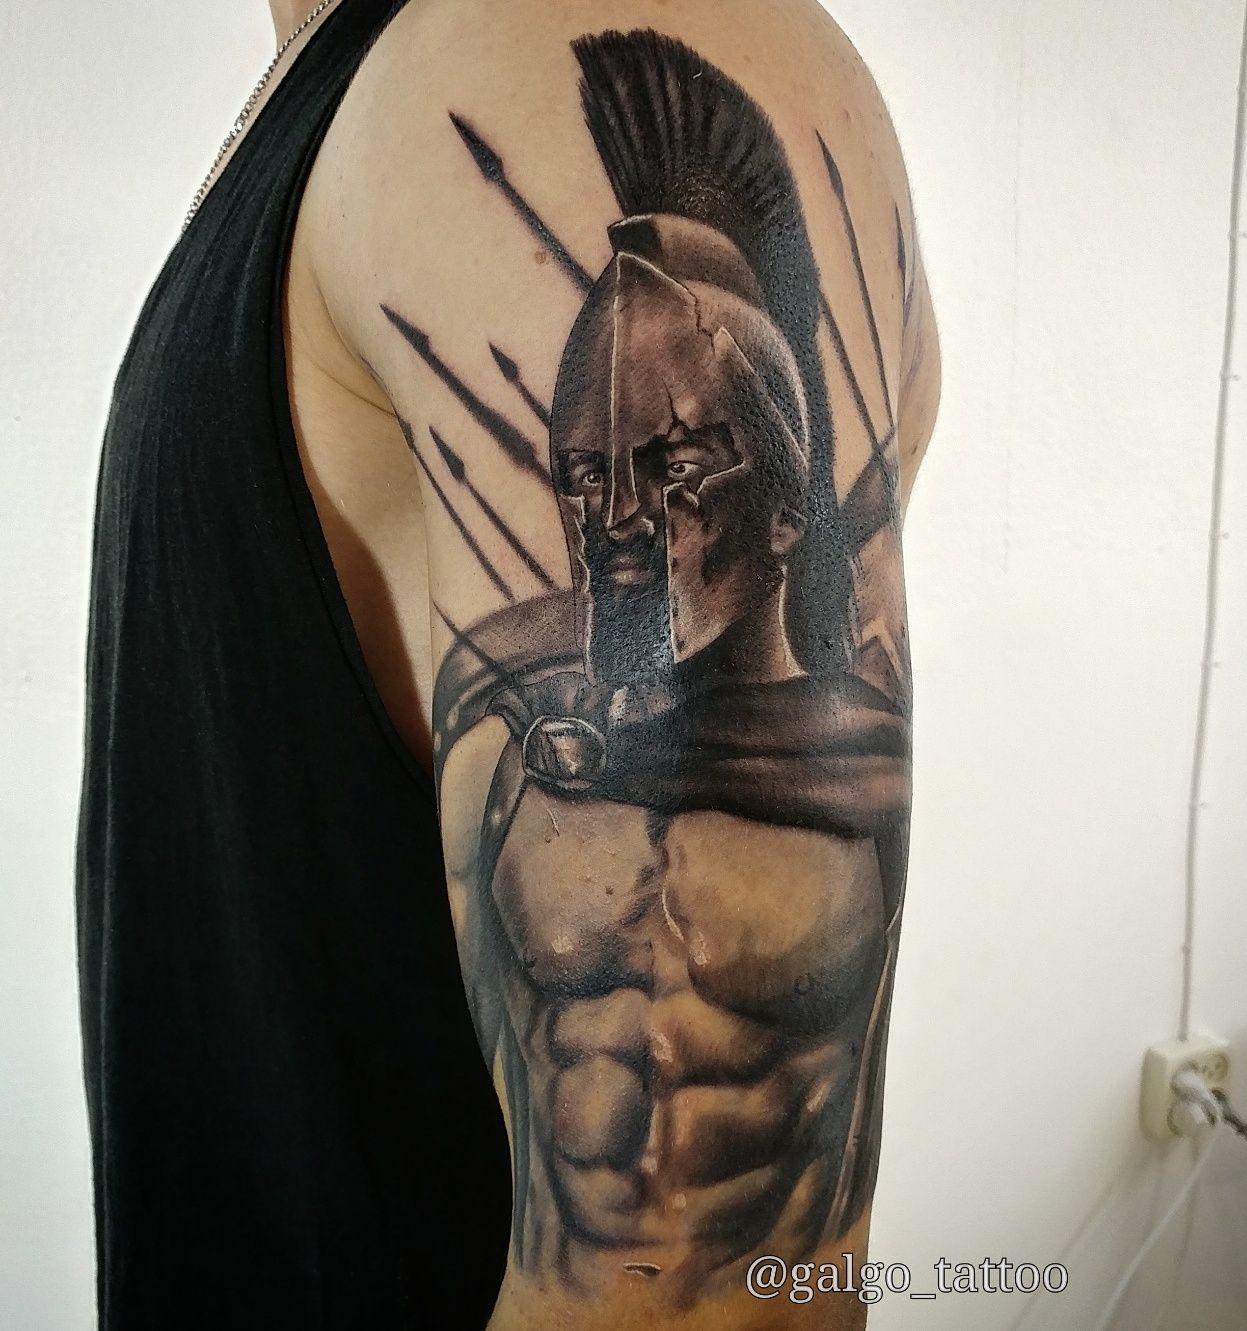 ಒ Tatuaje Pe Braț și Piept: Tatuaje Realista De Leonidas, El Rey Espartano De La